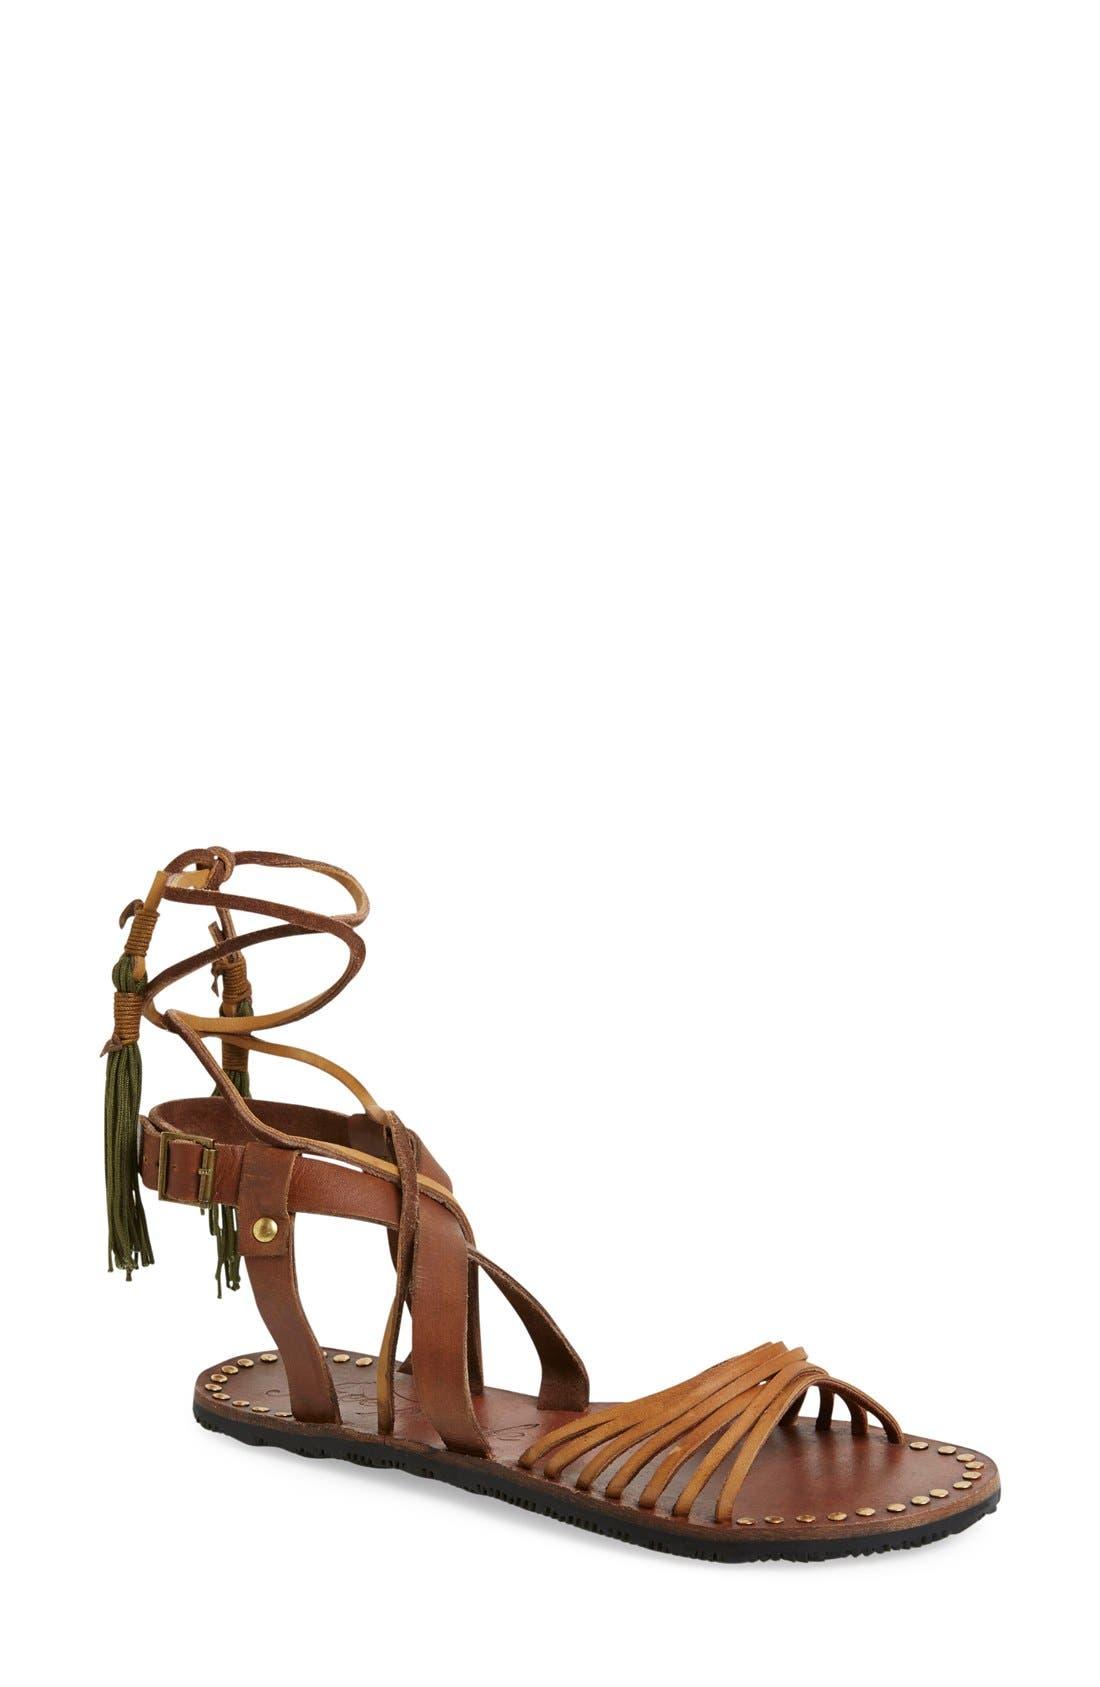 Alternate Image 1 Selected - Free People 'Willow' Gladiator Sandal (Women)